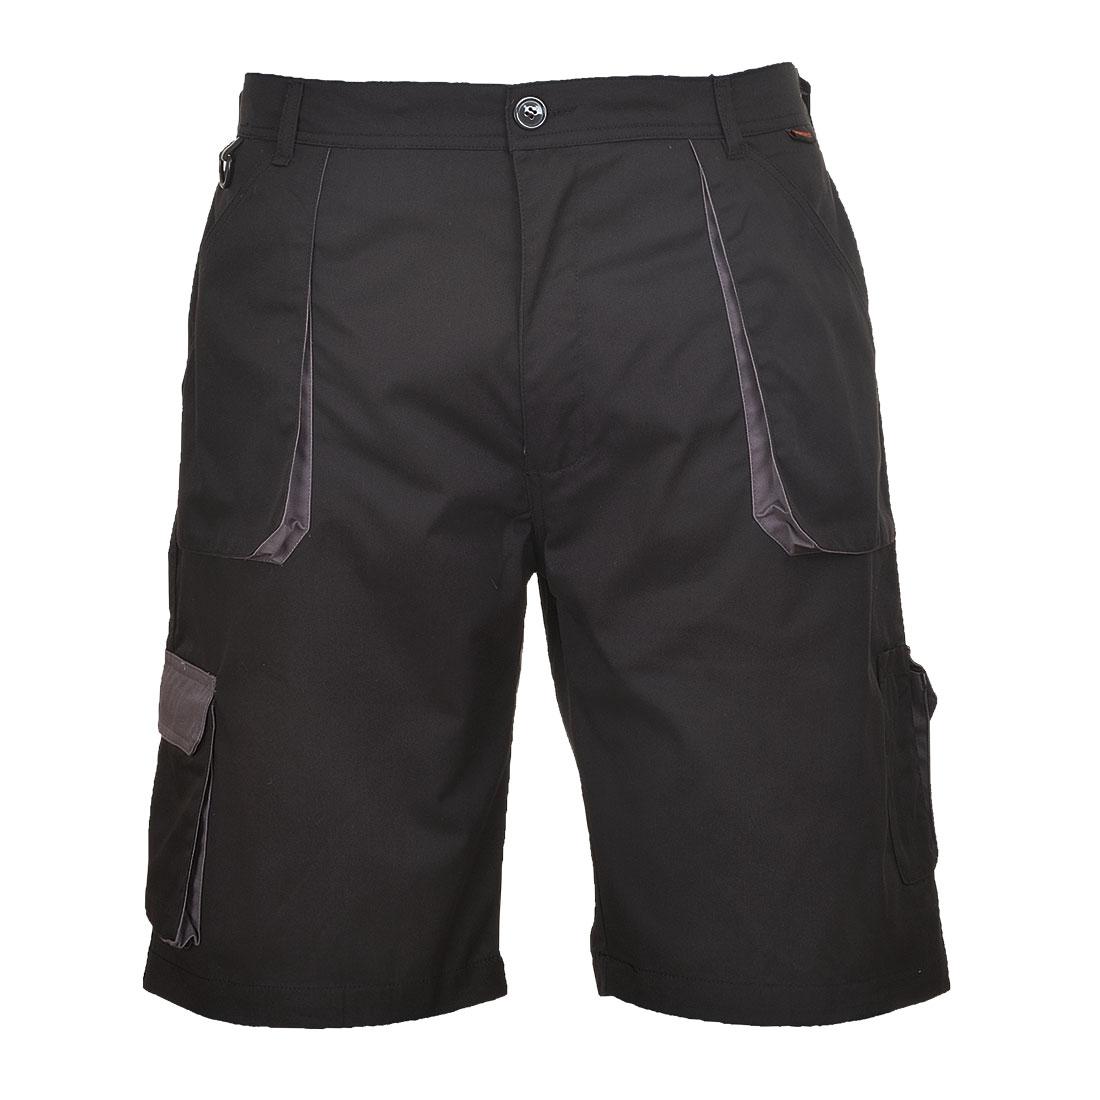 Portwest Texo Contrast Shorts - Black